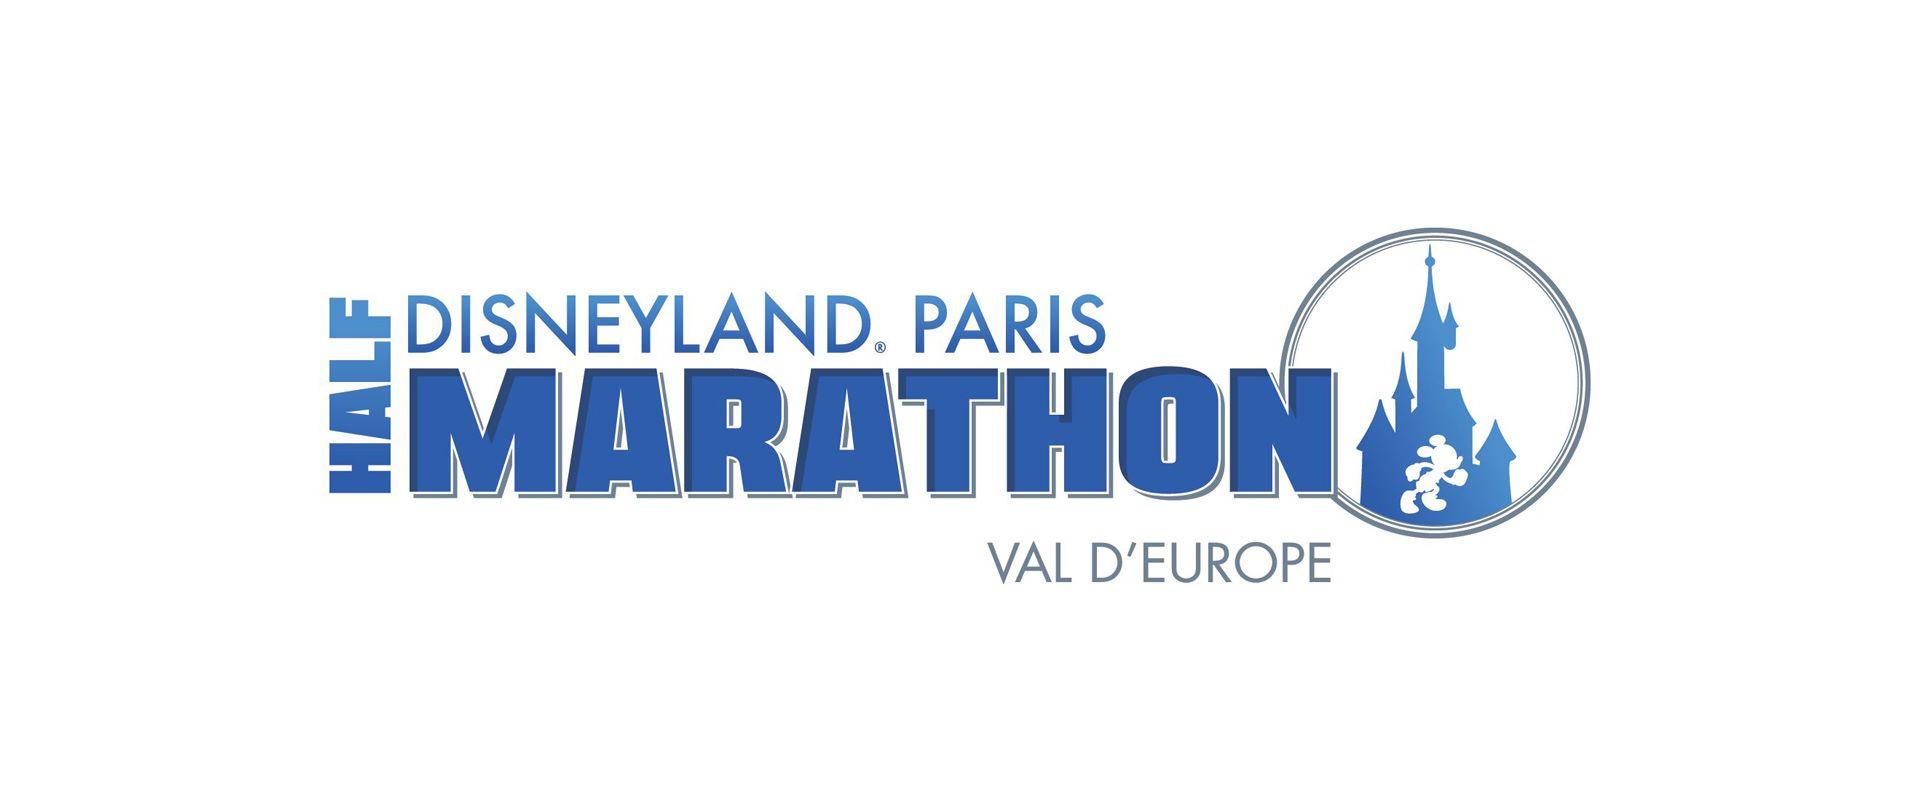 Le Dj Truck est partenaire de disneyland paris, marathon disney, semi-marathon disney